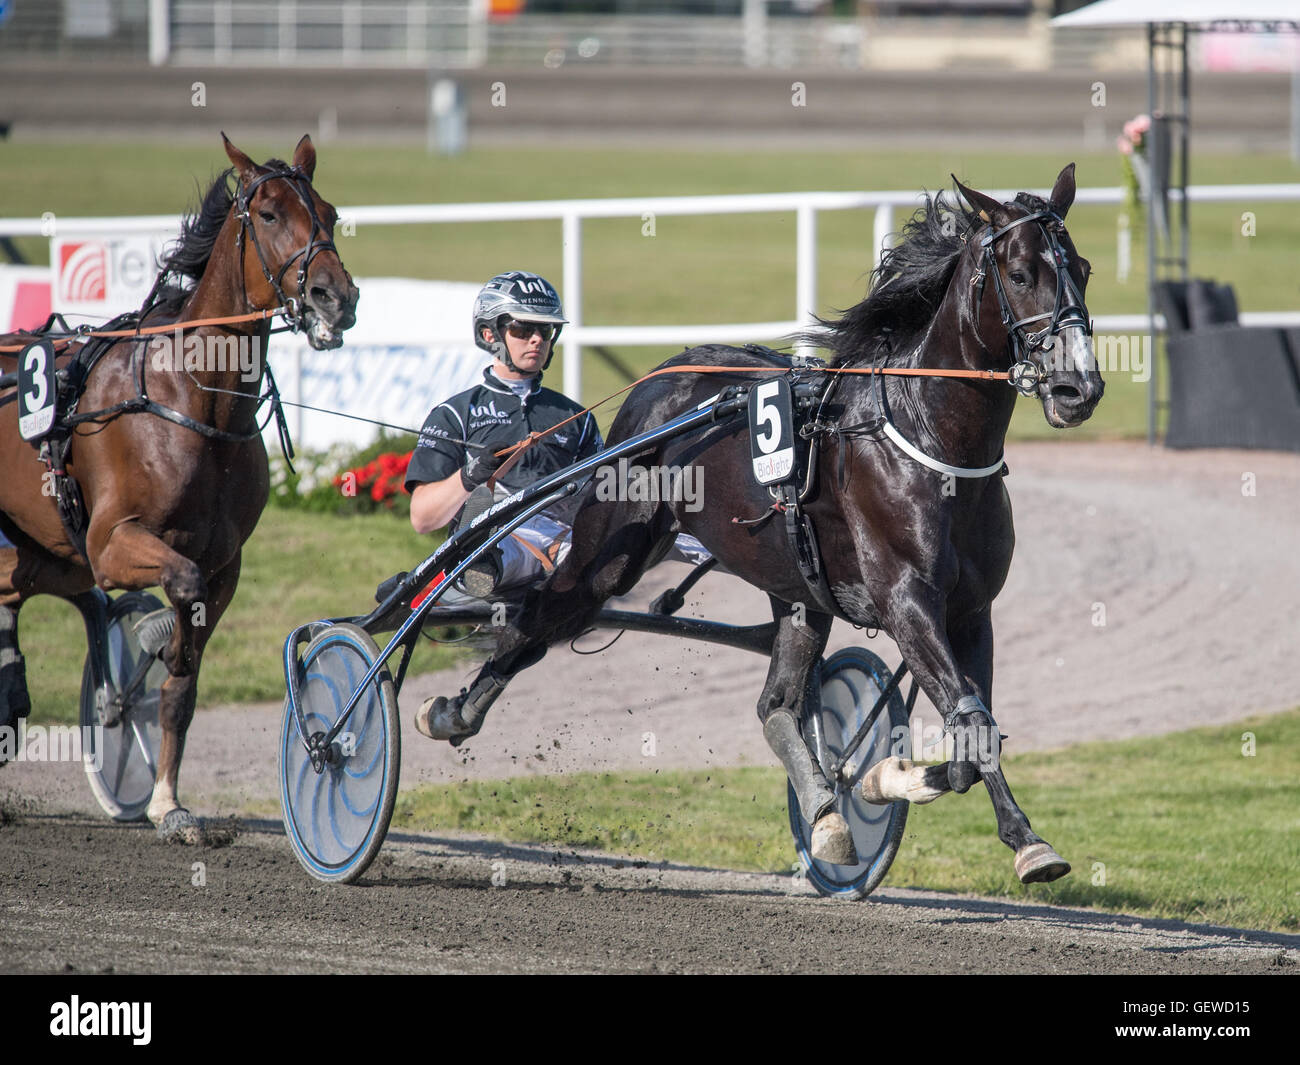 Harness racing driver Mattias Djuse at the summer meeting at Axevalla harness racing track - Stock Image